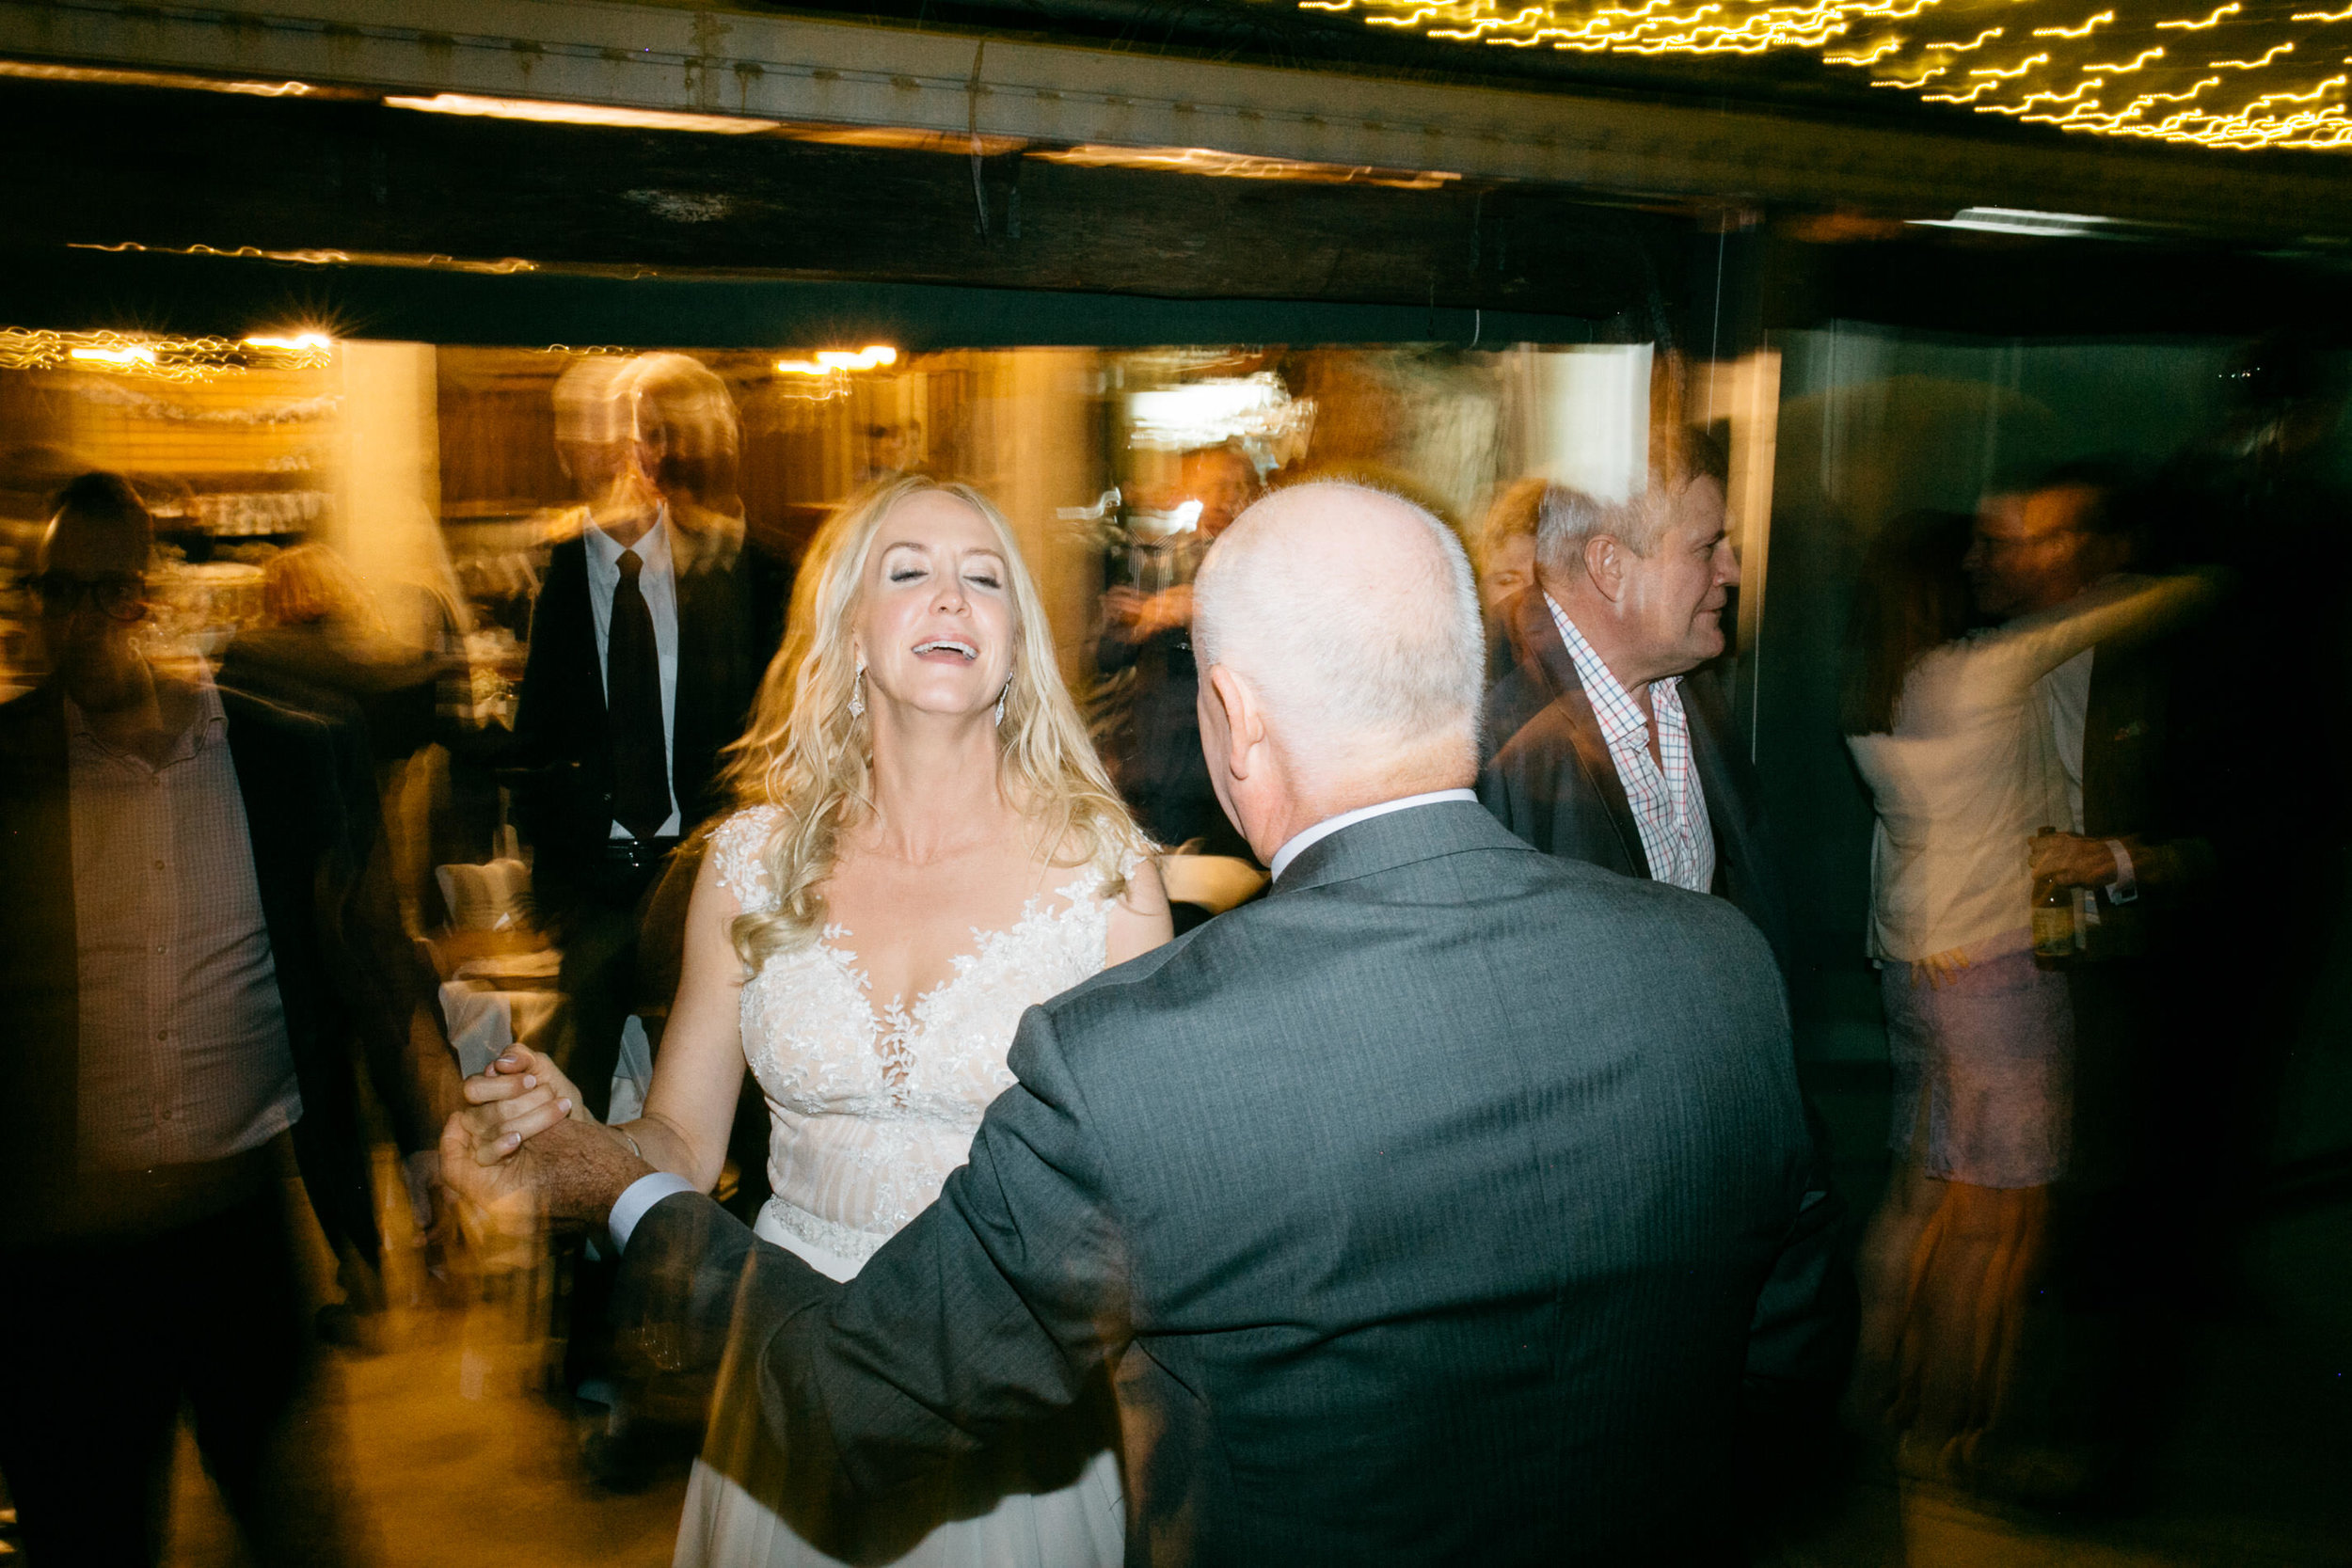 True North Photography_Boomerang Farm_Stacey and Isaac_Gold Coast Wedding_Barm Wedding_Hinterland Wedding-214.jpg